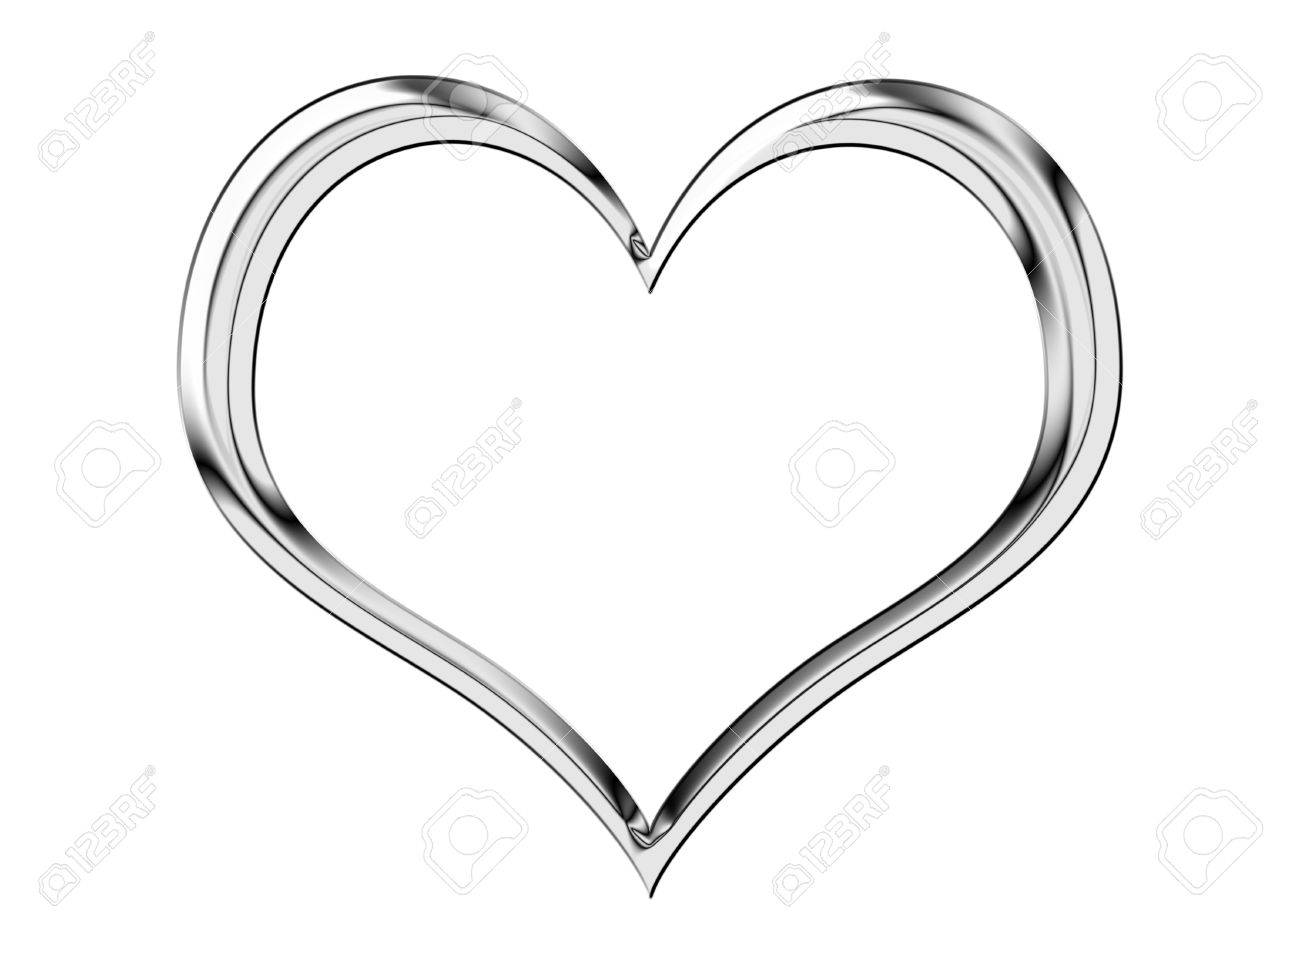 A shiny, metallic heart shape isolated on white Stock Photo - 2587217